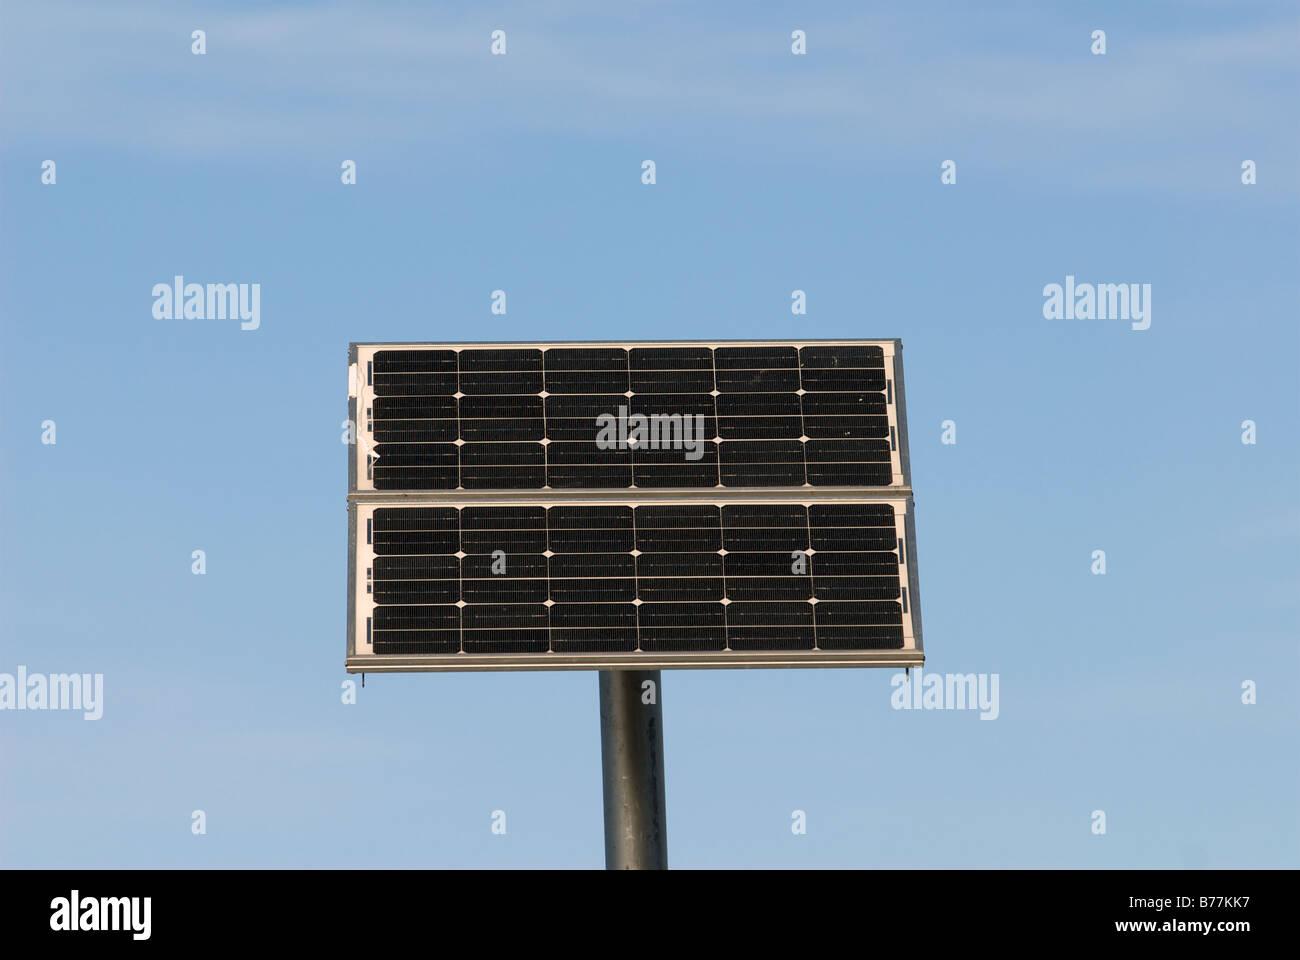 Panel Solar, Levekusen, Renania del Norte-Westfalia, Alemania. Imagen De Stock